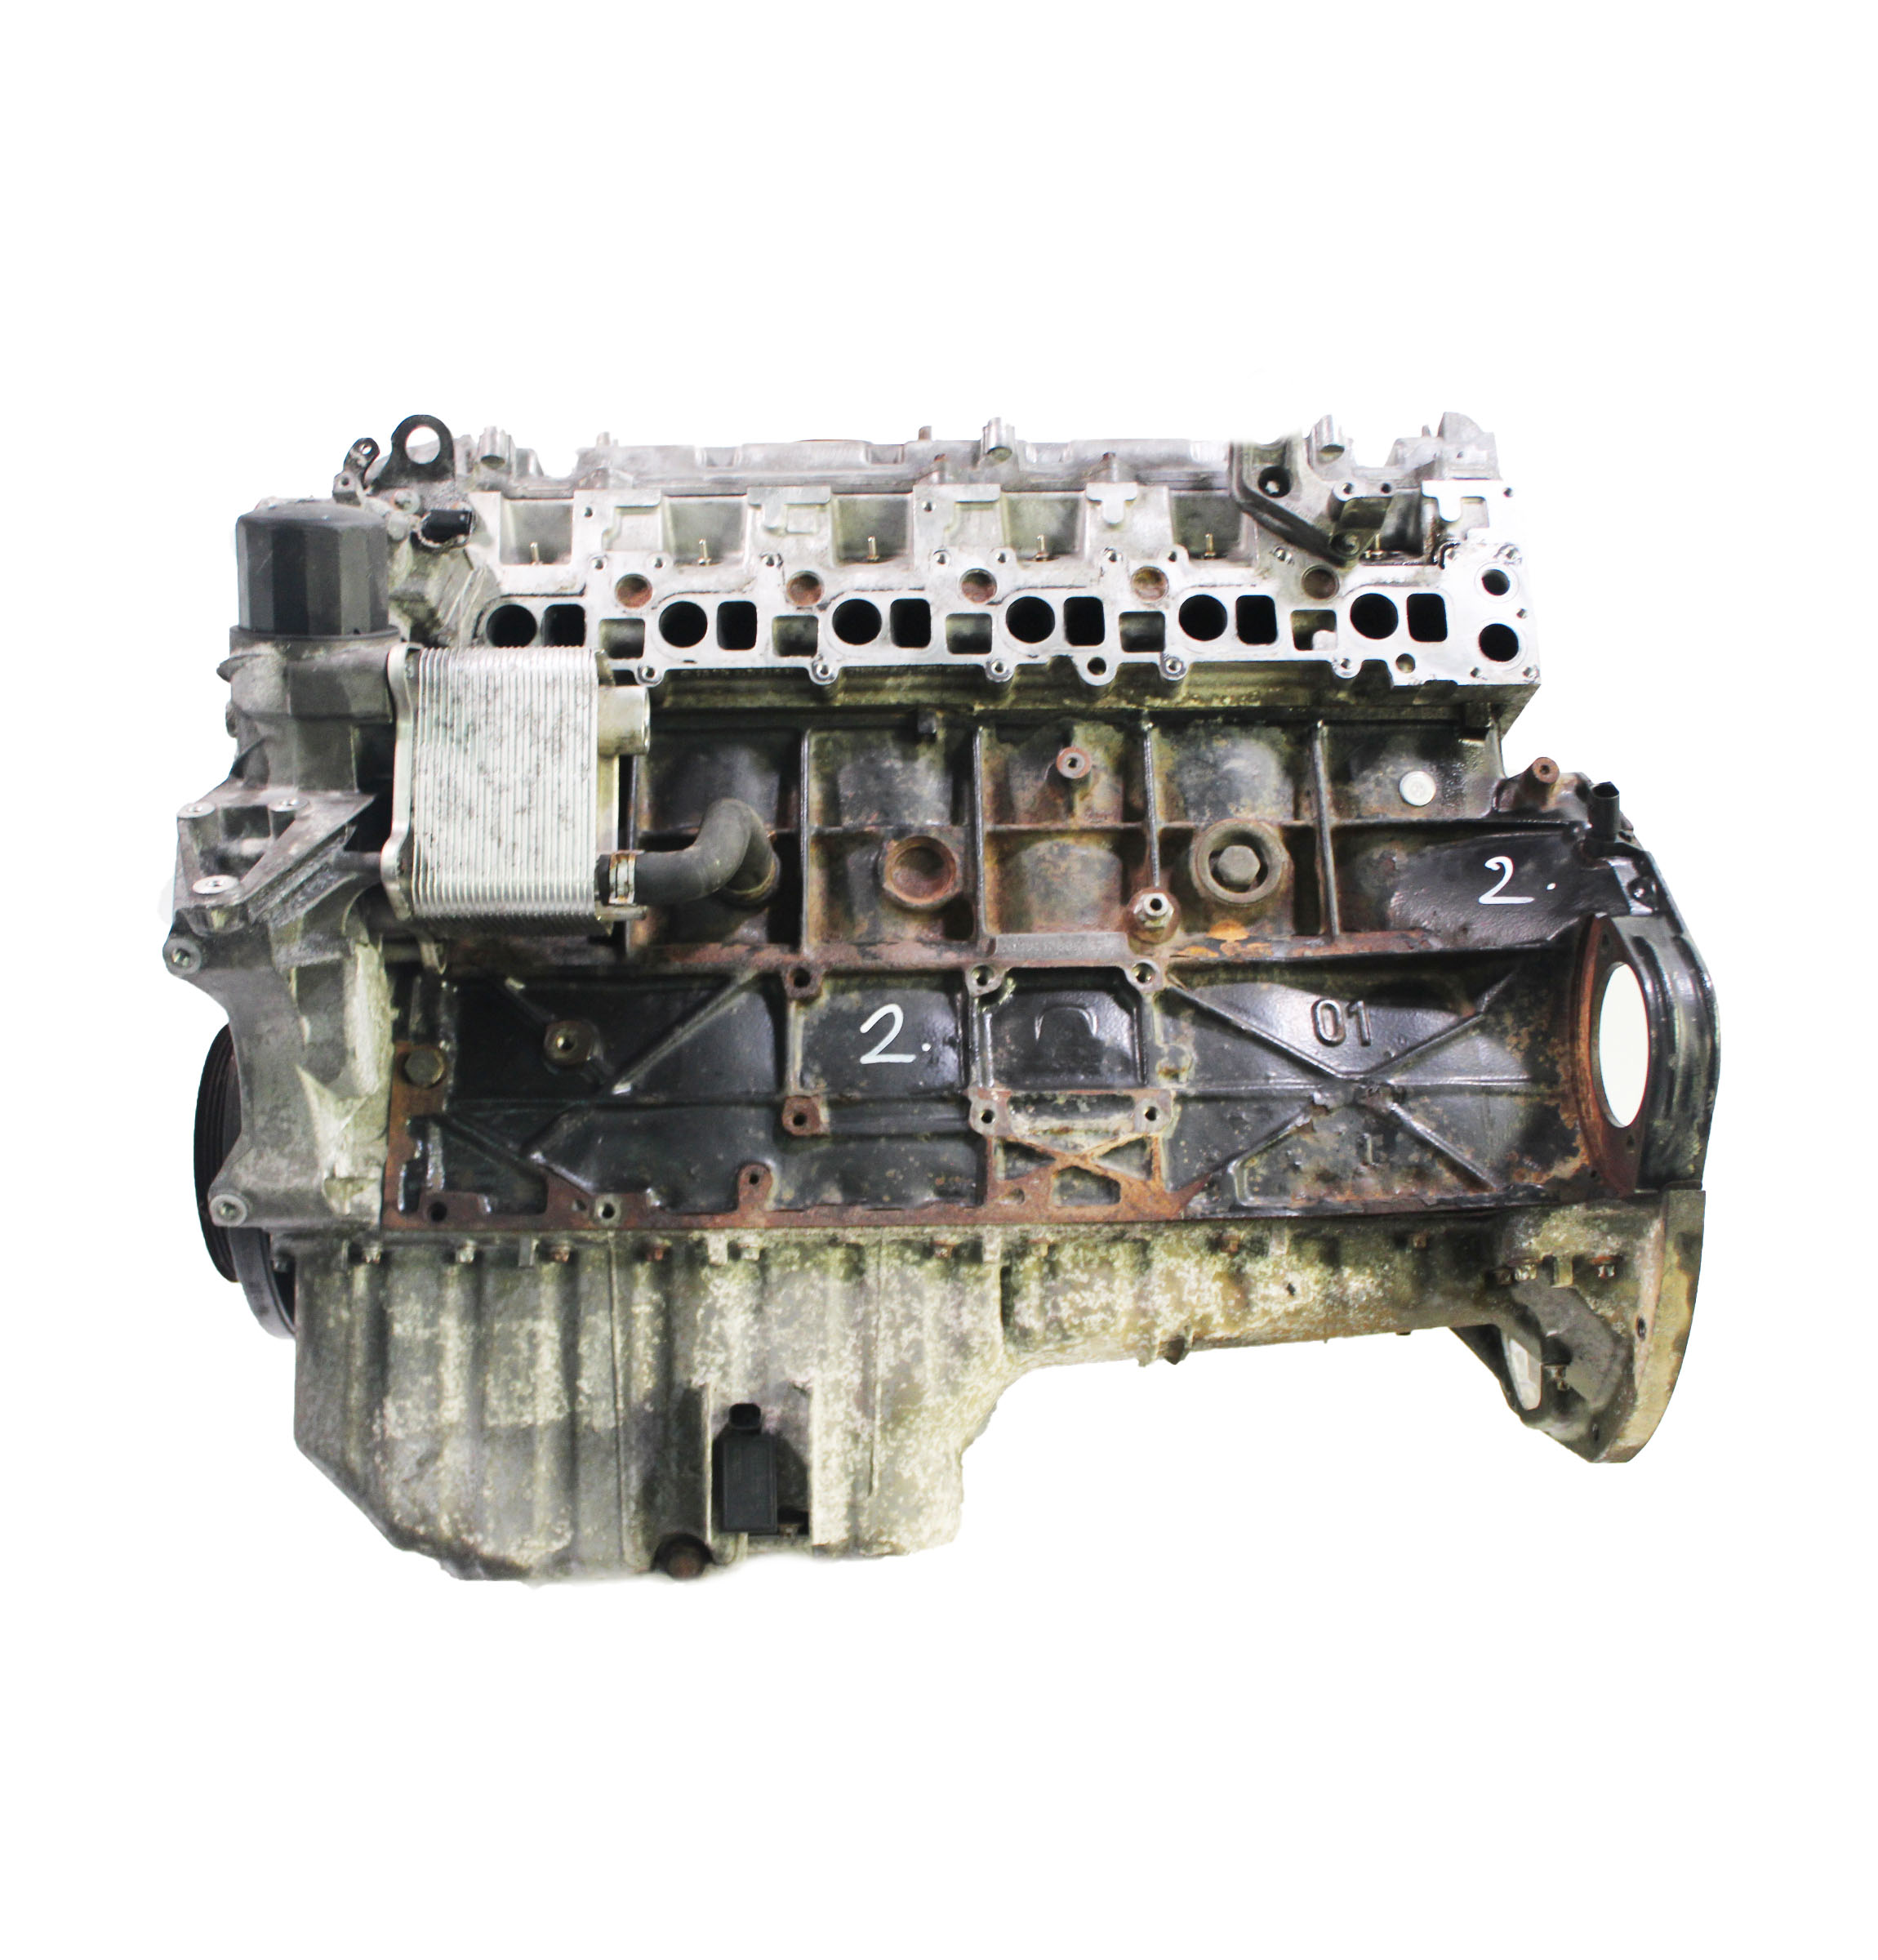 Motor für Mercedes Benz E-Klasse W210 S210 3,2 CDI 613.961 OM613 OM613.961